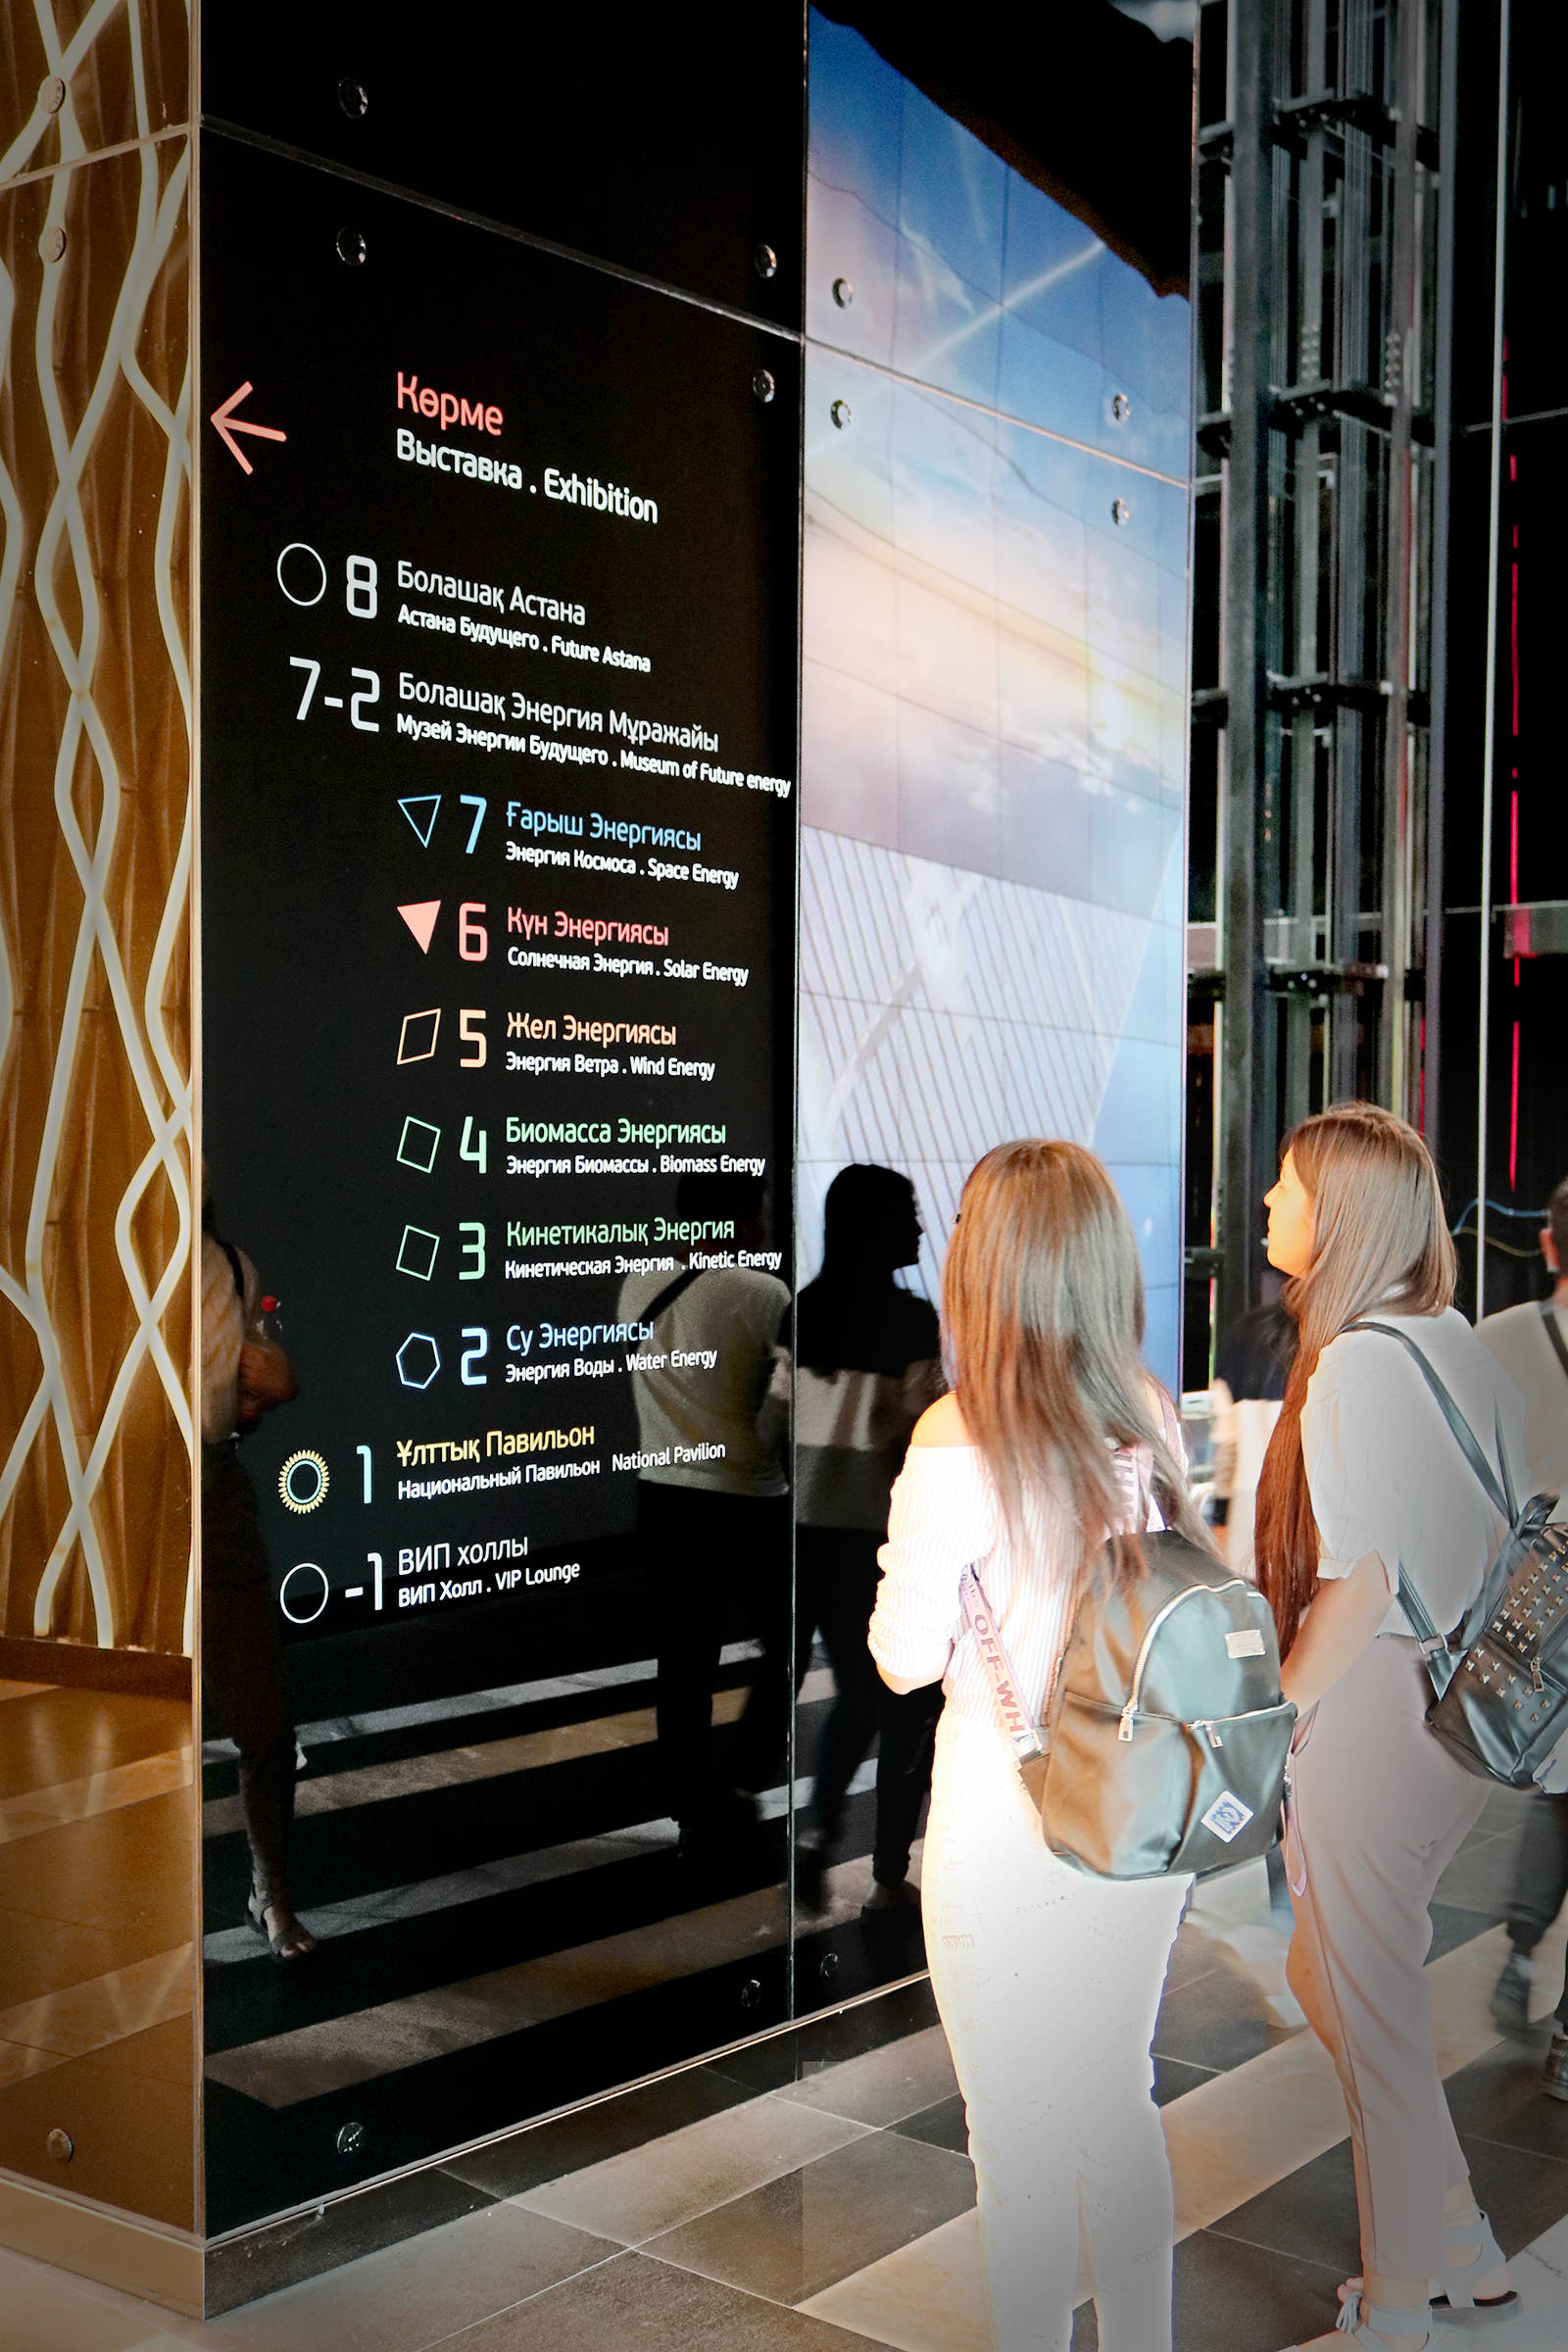 Astana_Sphere_Directory_3739lr.jpg